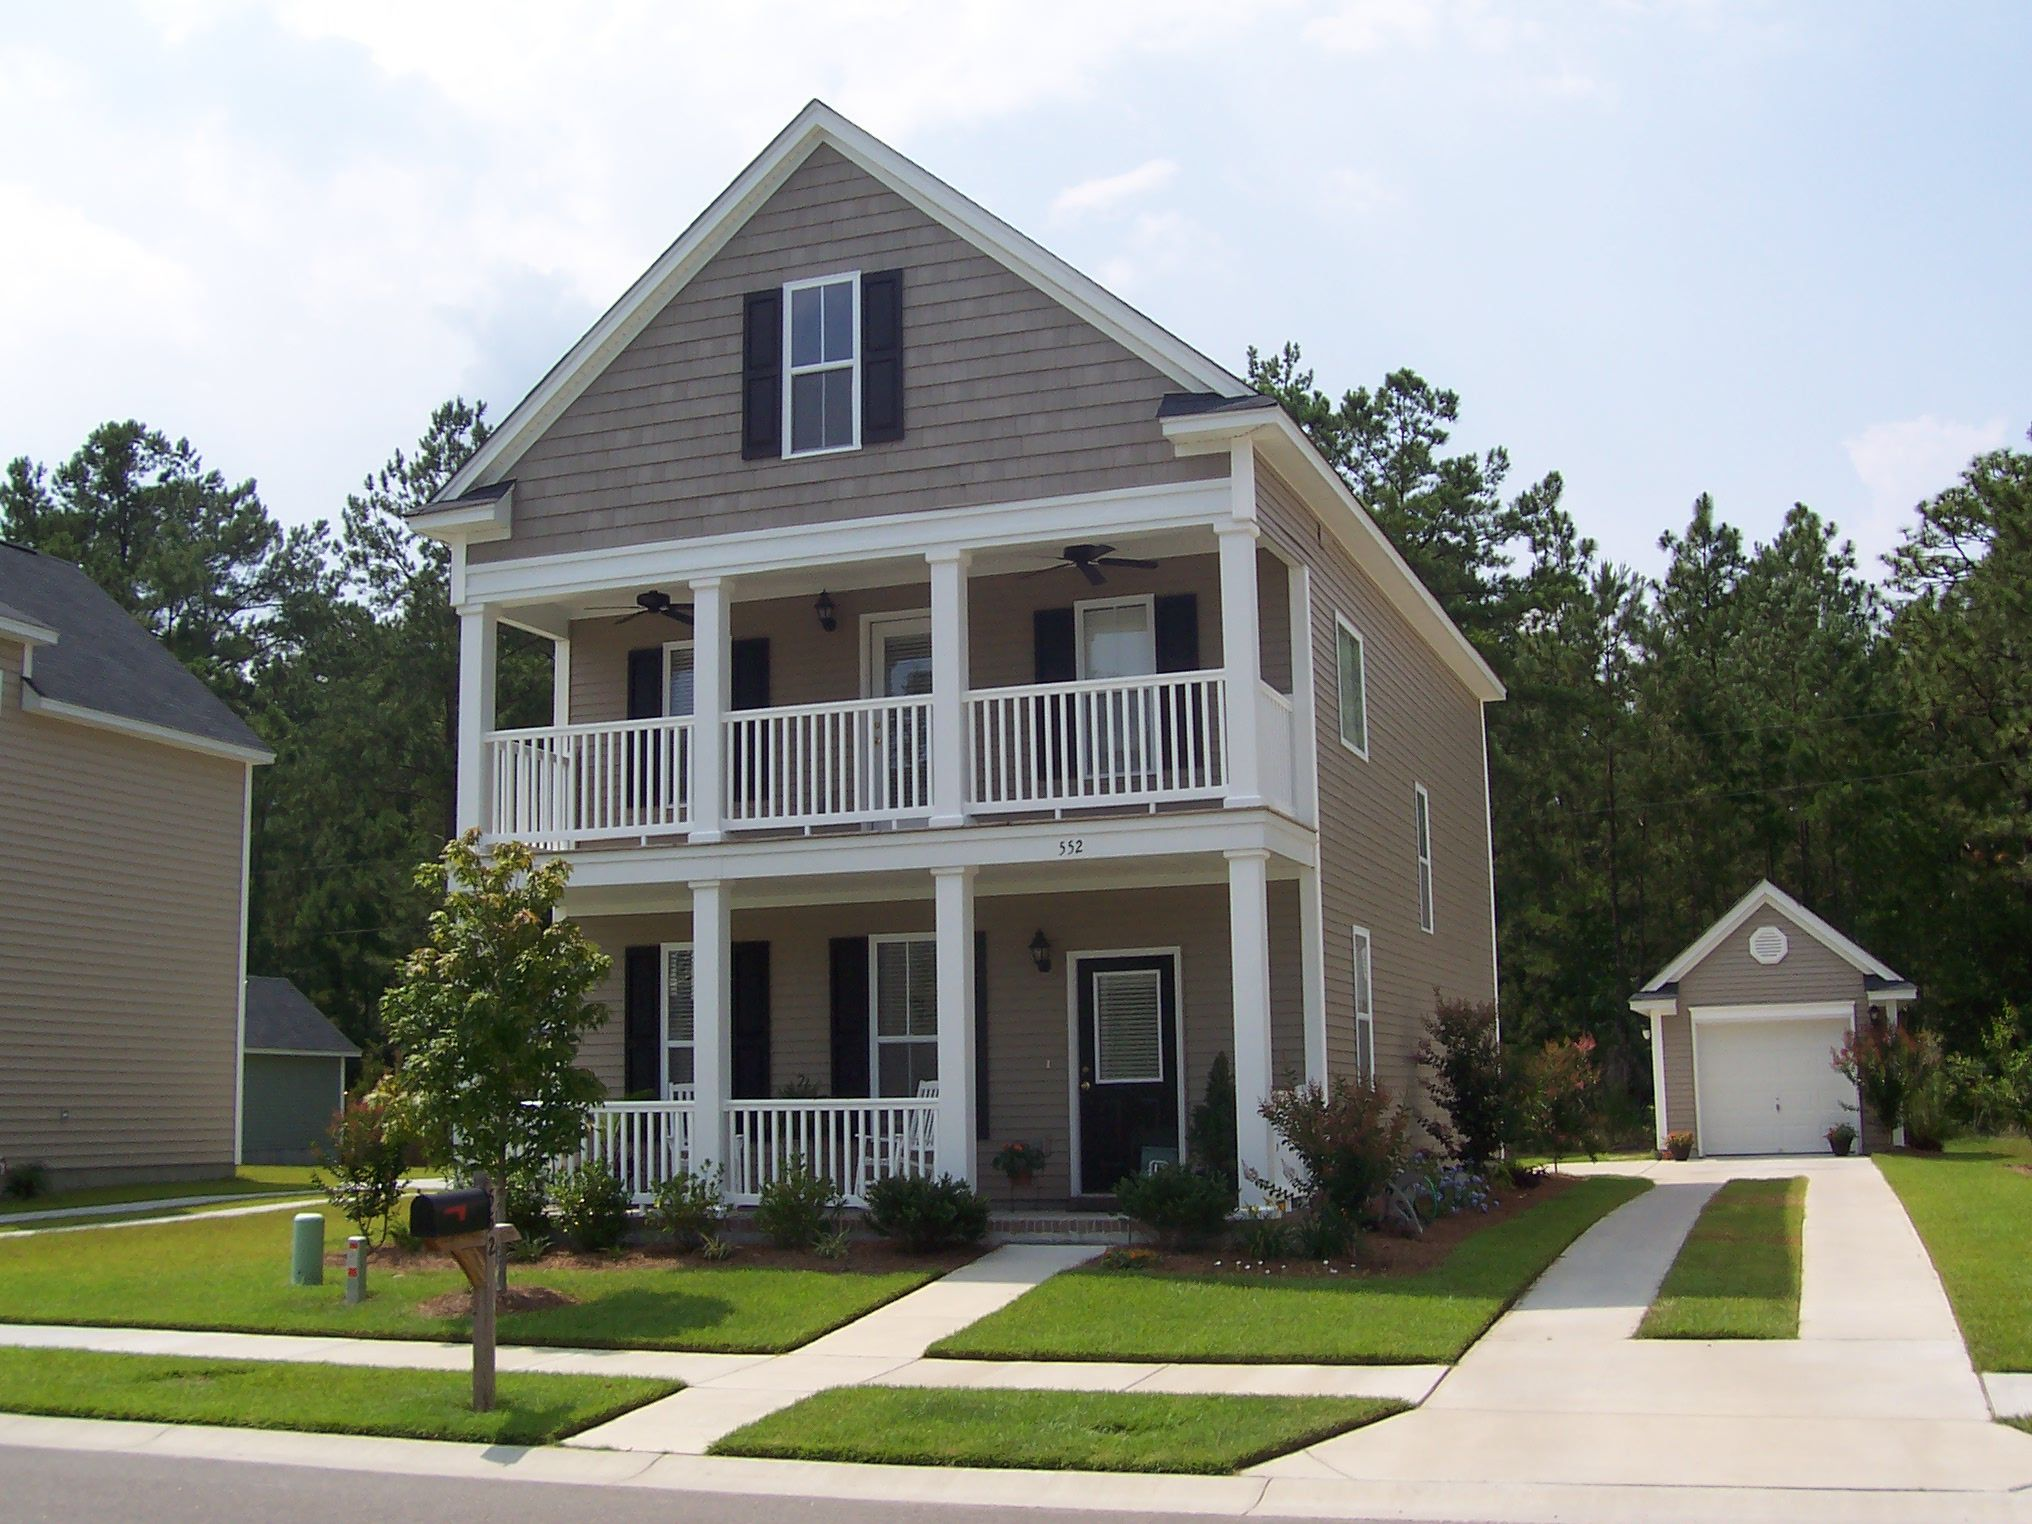 Prime 17 Best Images About House Colors On Pinterest Exterior Colors Largest Home Design Picture Inspirations Pitcheantrous